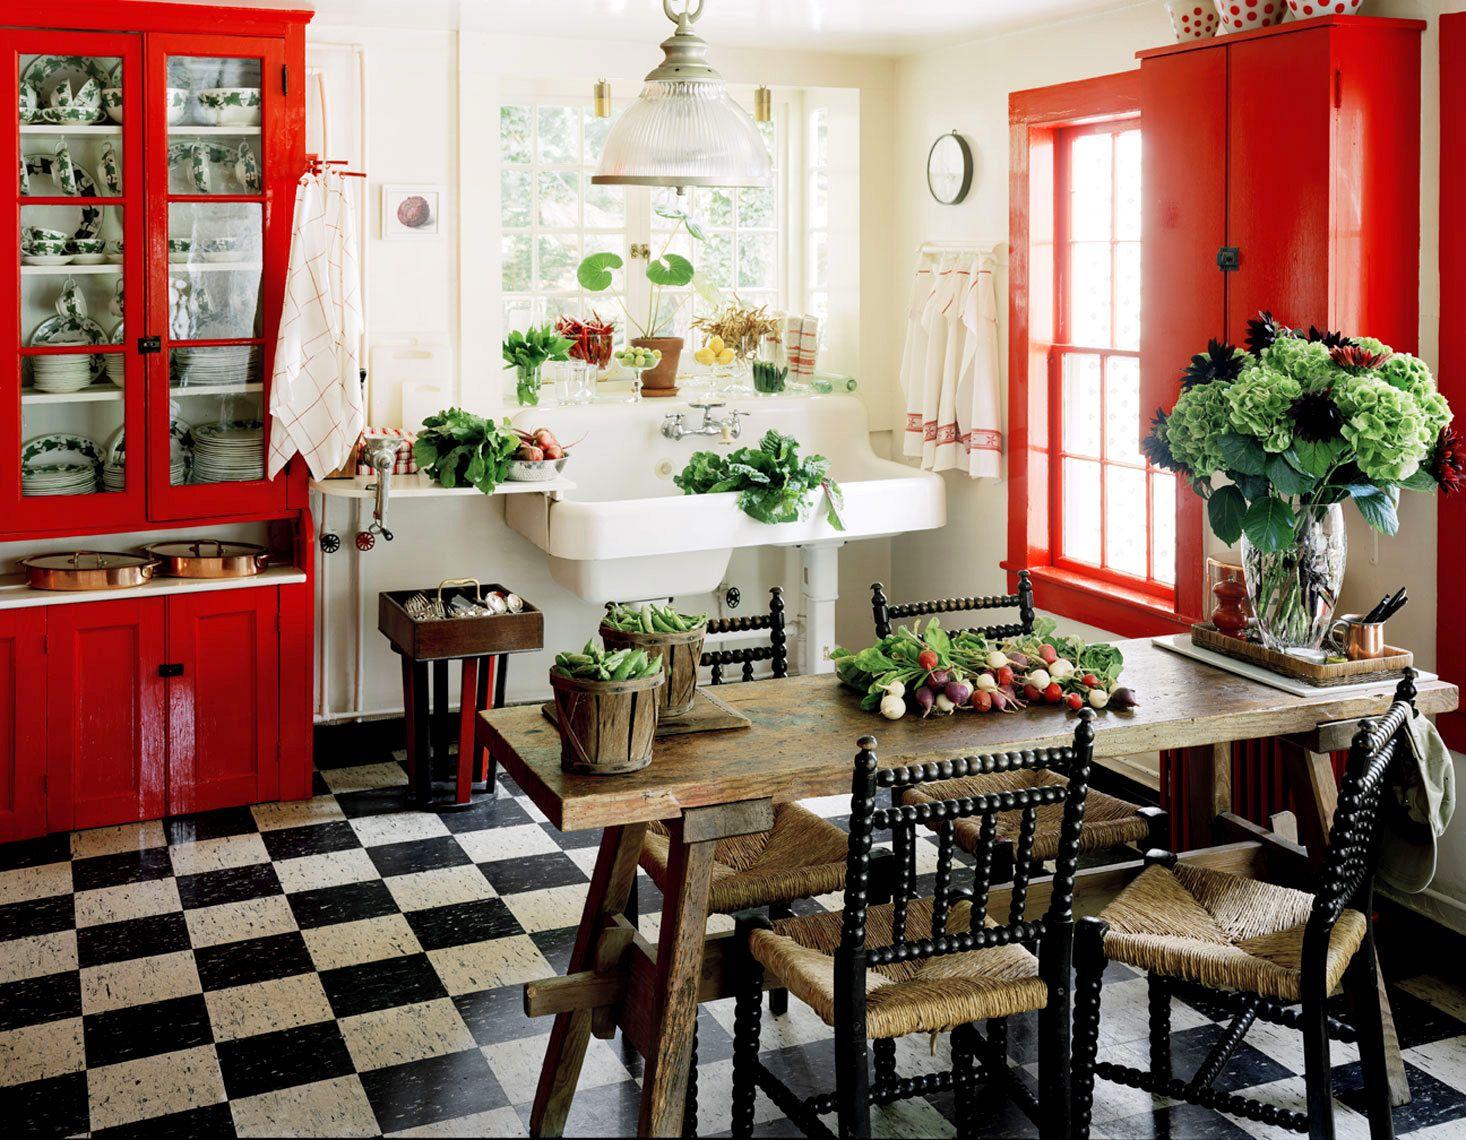 Black And White Checkerboard Kitchen Ideas on black and white checkered canister sets, black and white tile kitchen floor, black and white kitchen designs, black and white kitchen floor rug,